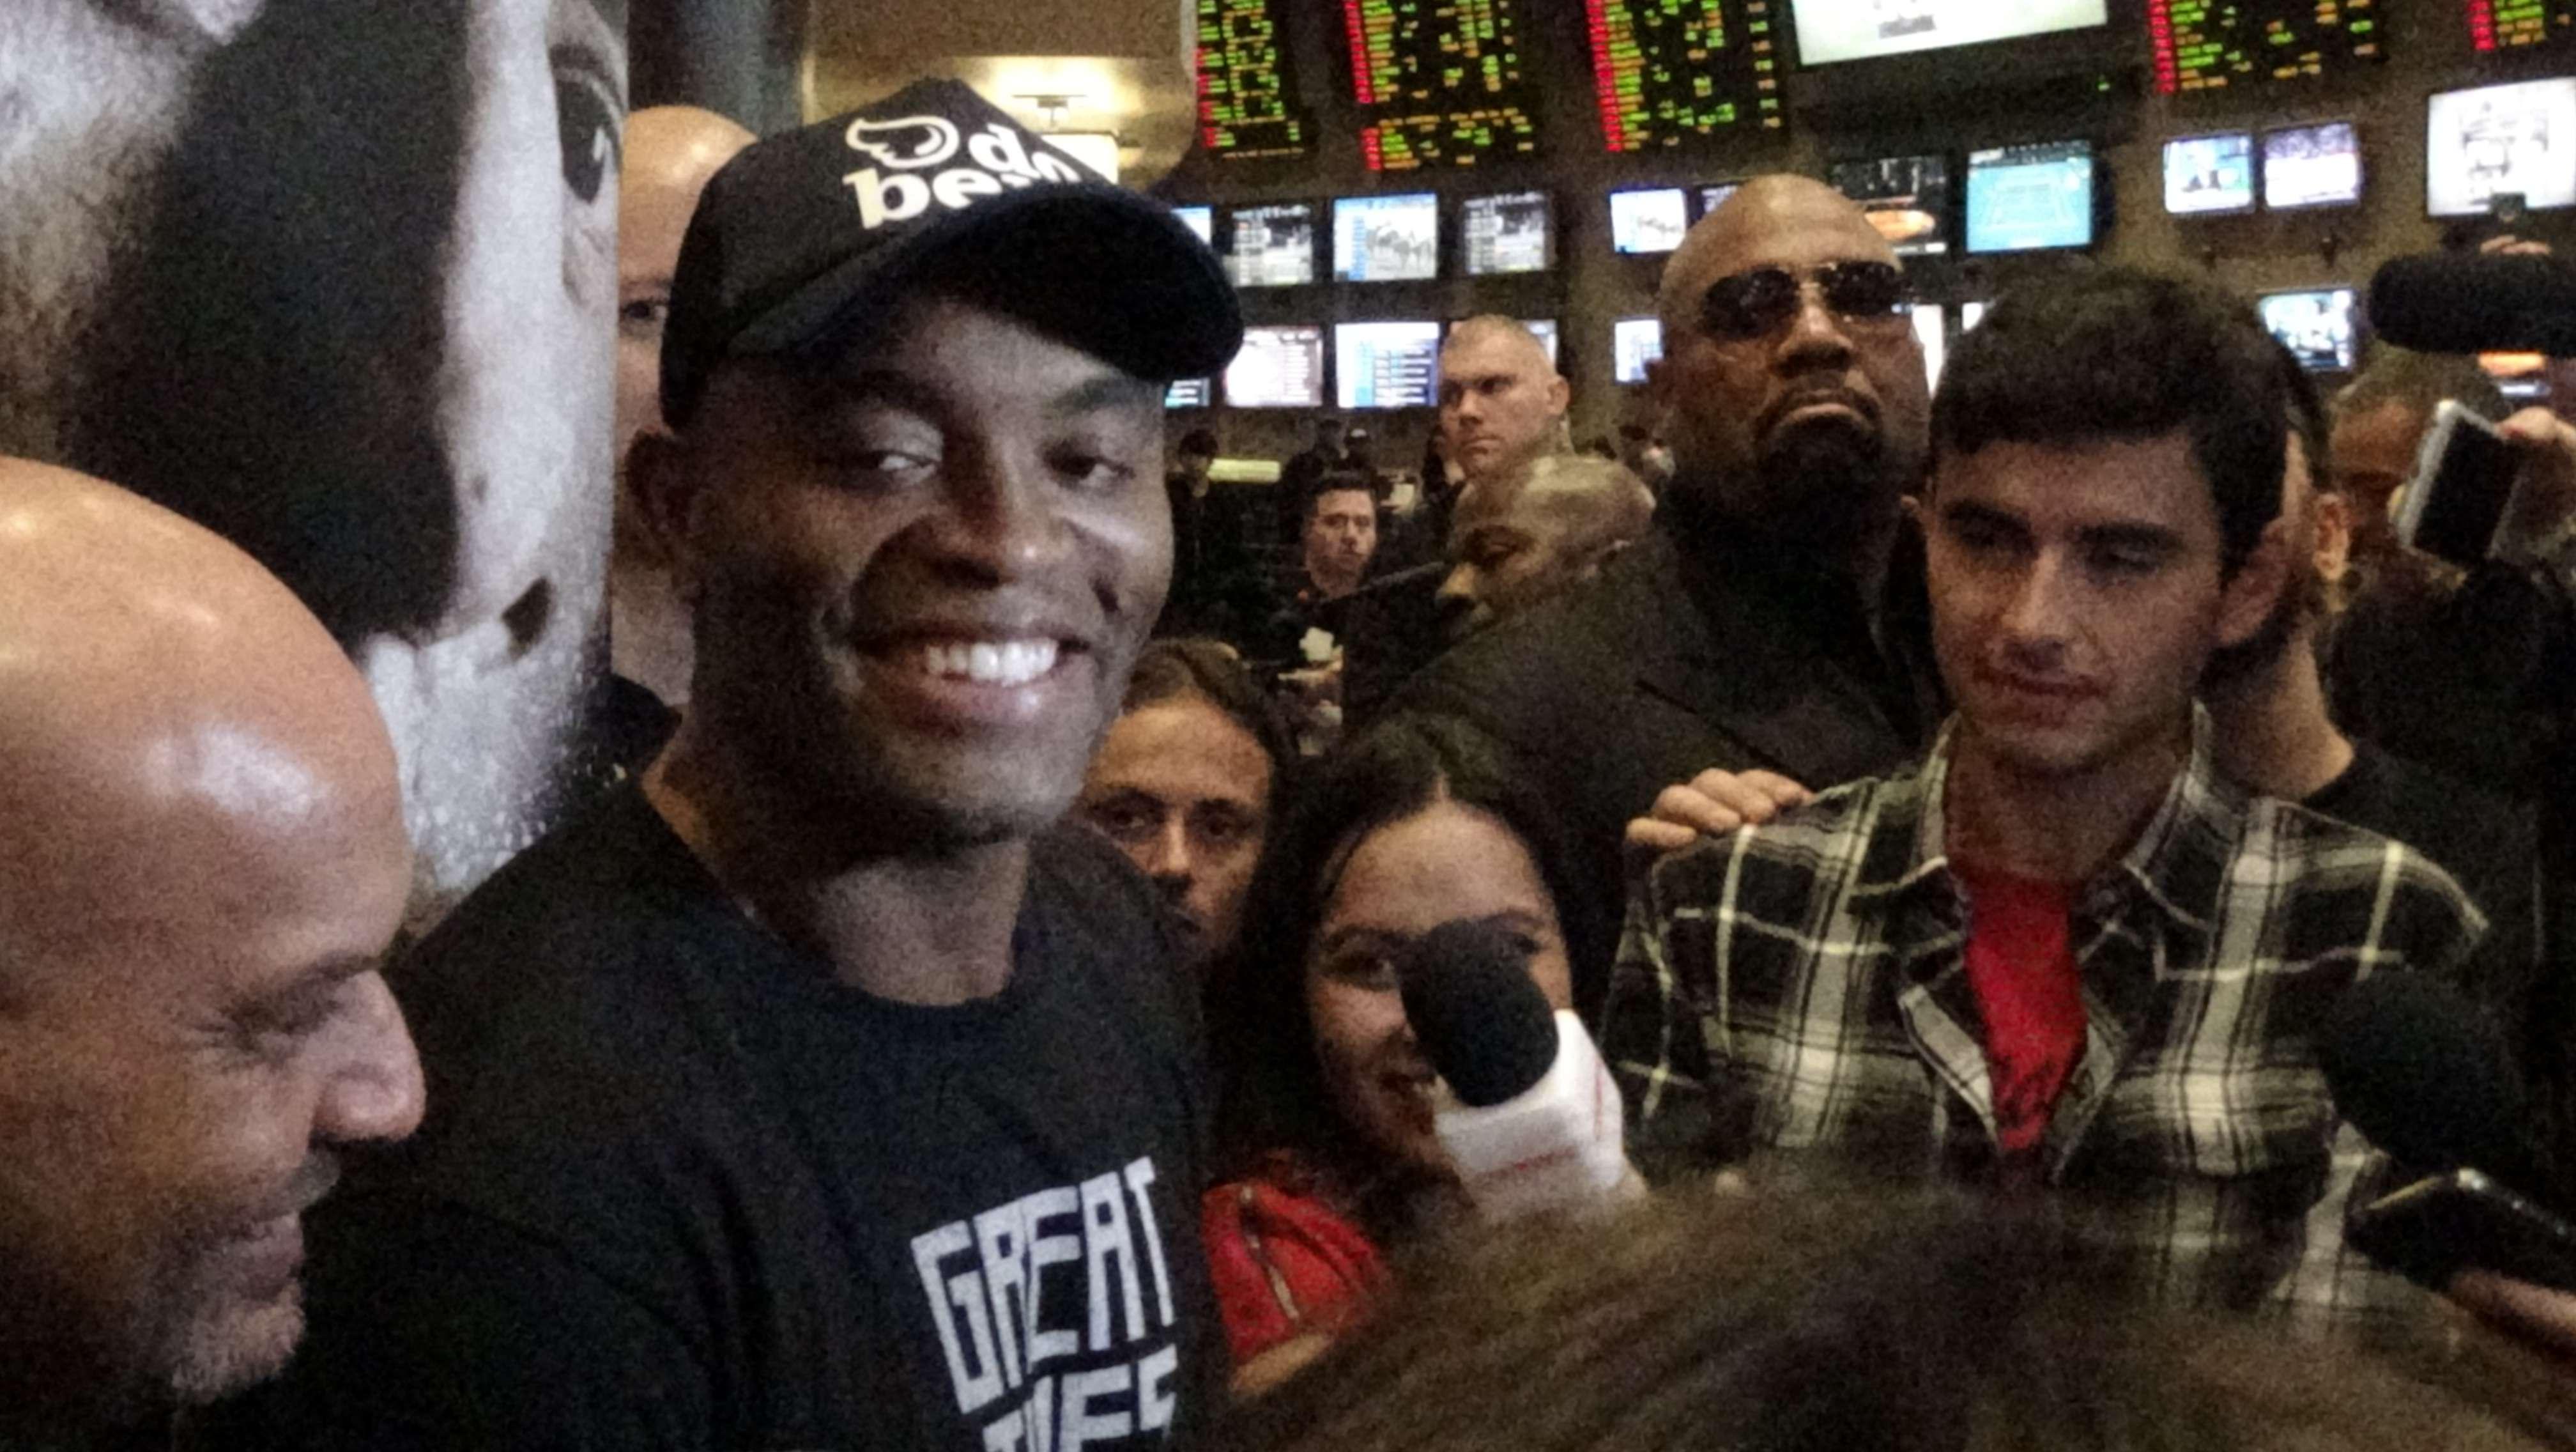 Anderson Silva mostra bom humor após treino aberto do UFC 183 Foto: Guilherme Dorini/Terra